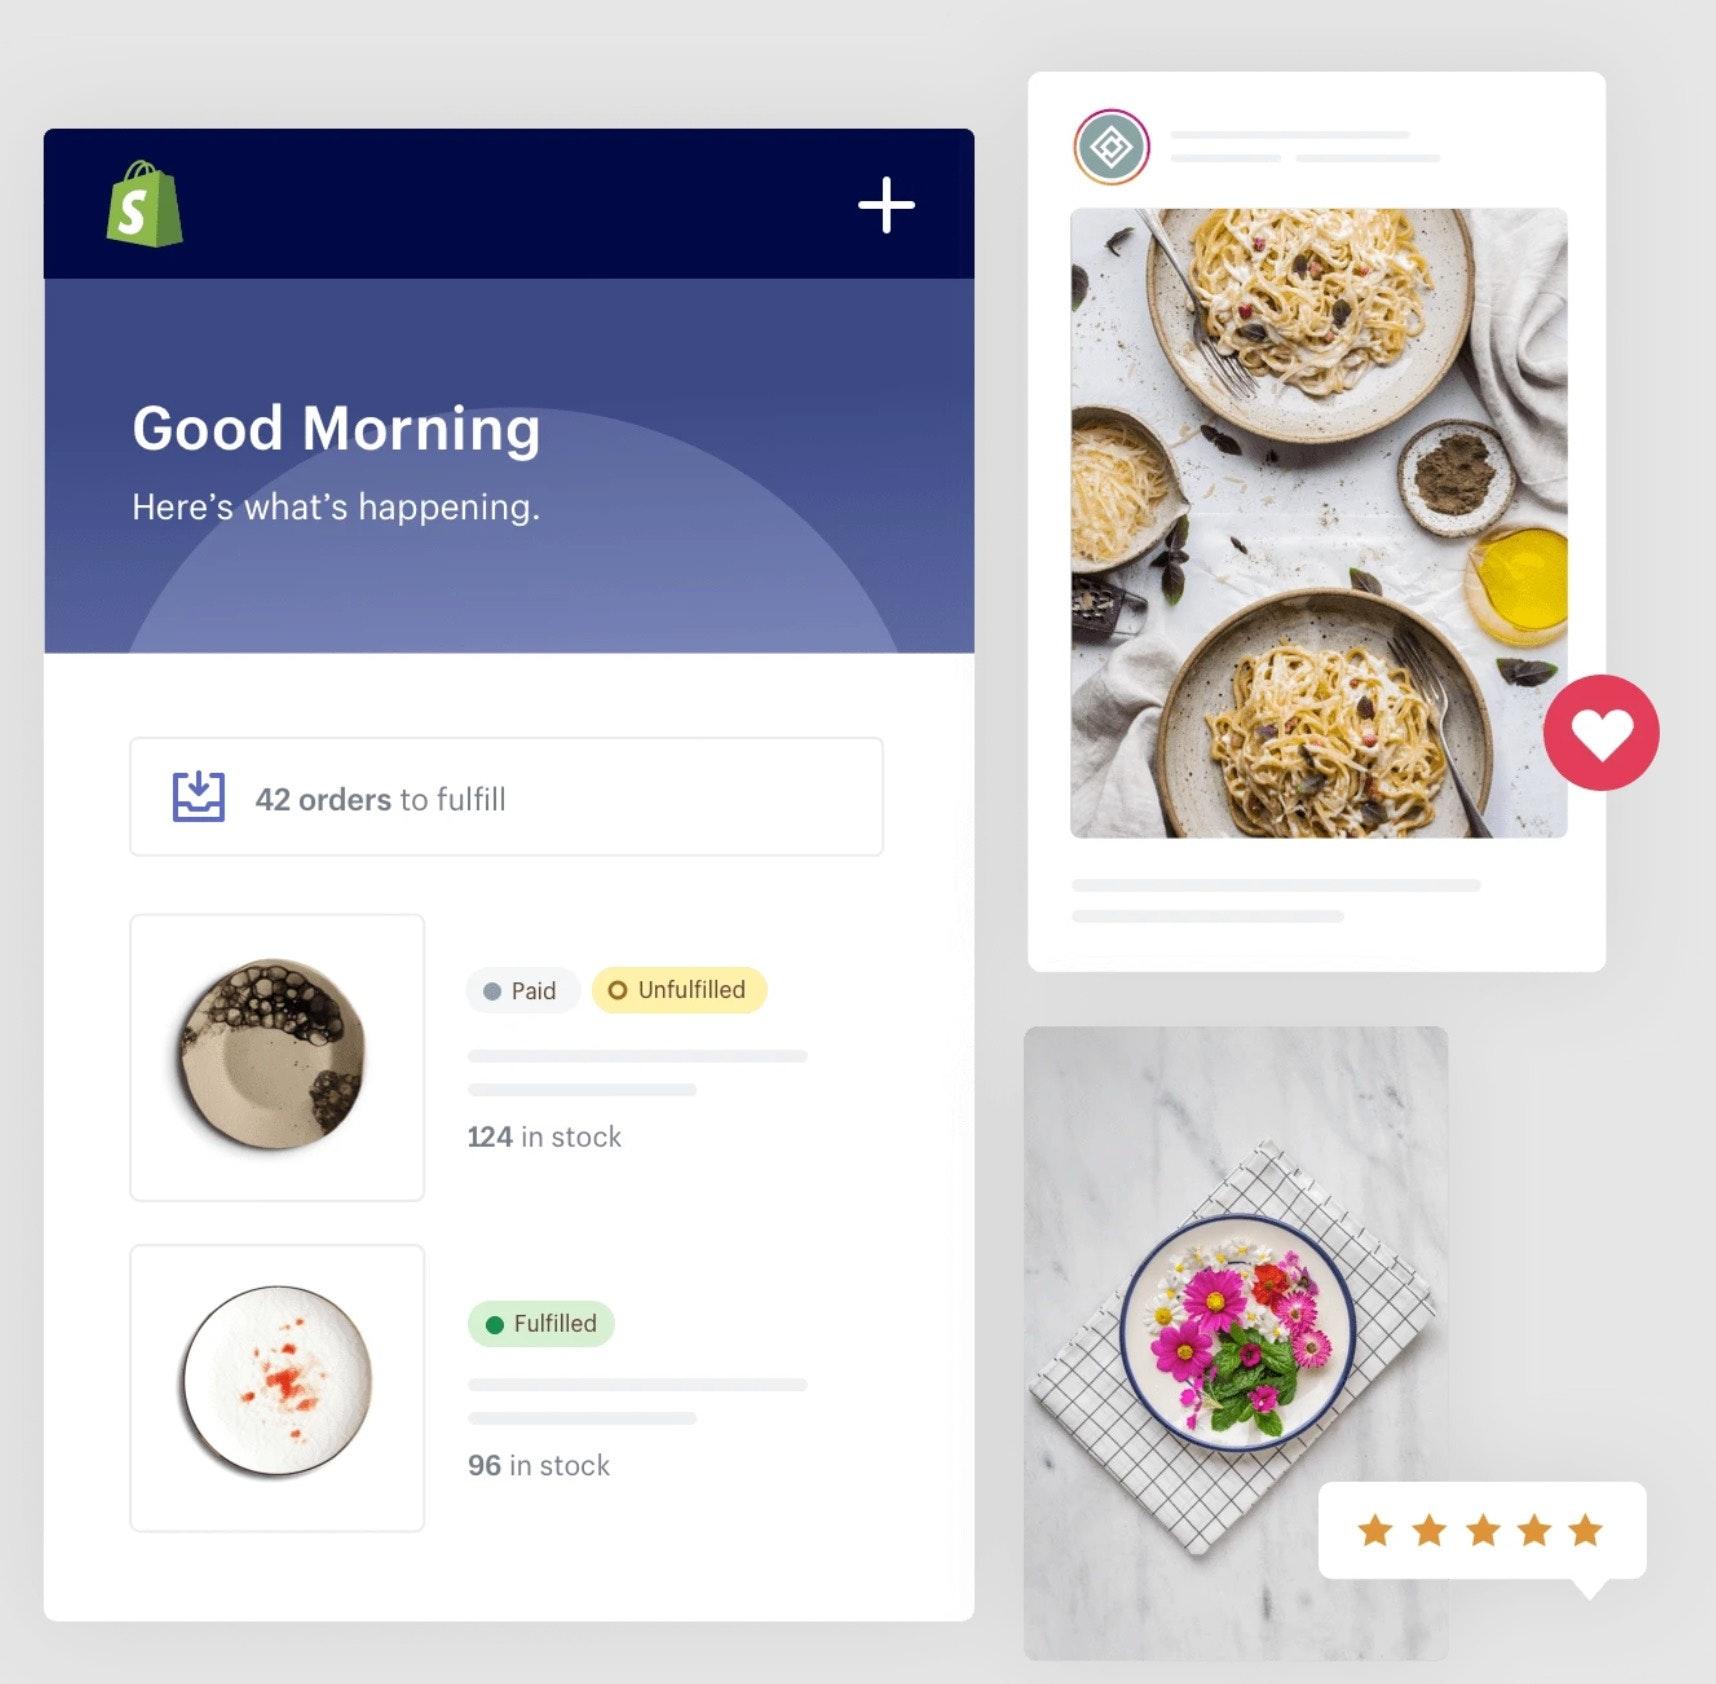 multichannel commerce platform: Shopify